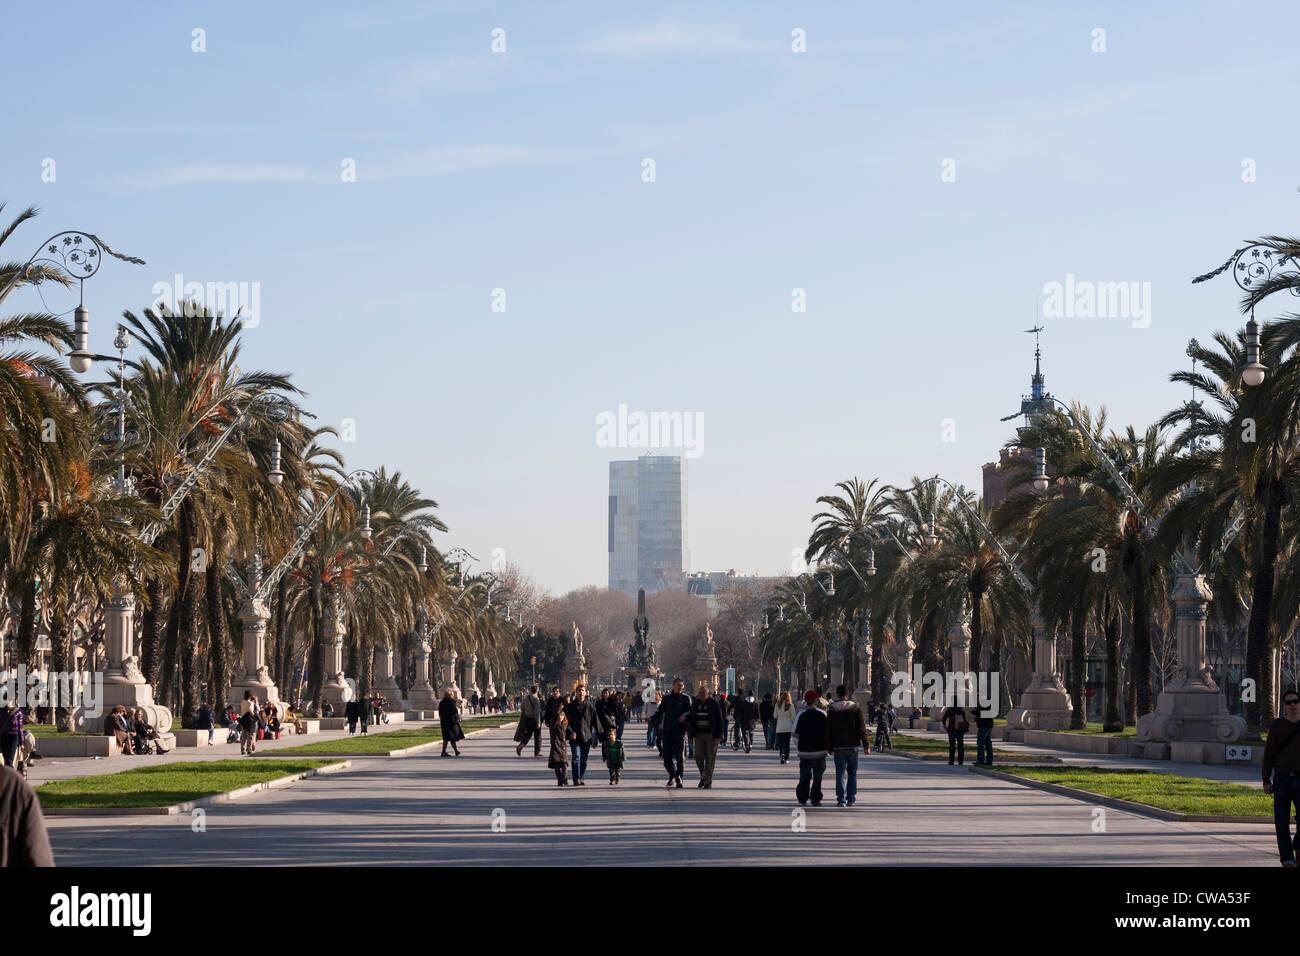 View along the Passieg de Luis Companys in Barcelona, Catalonia. - Stock Image